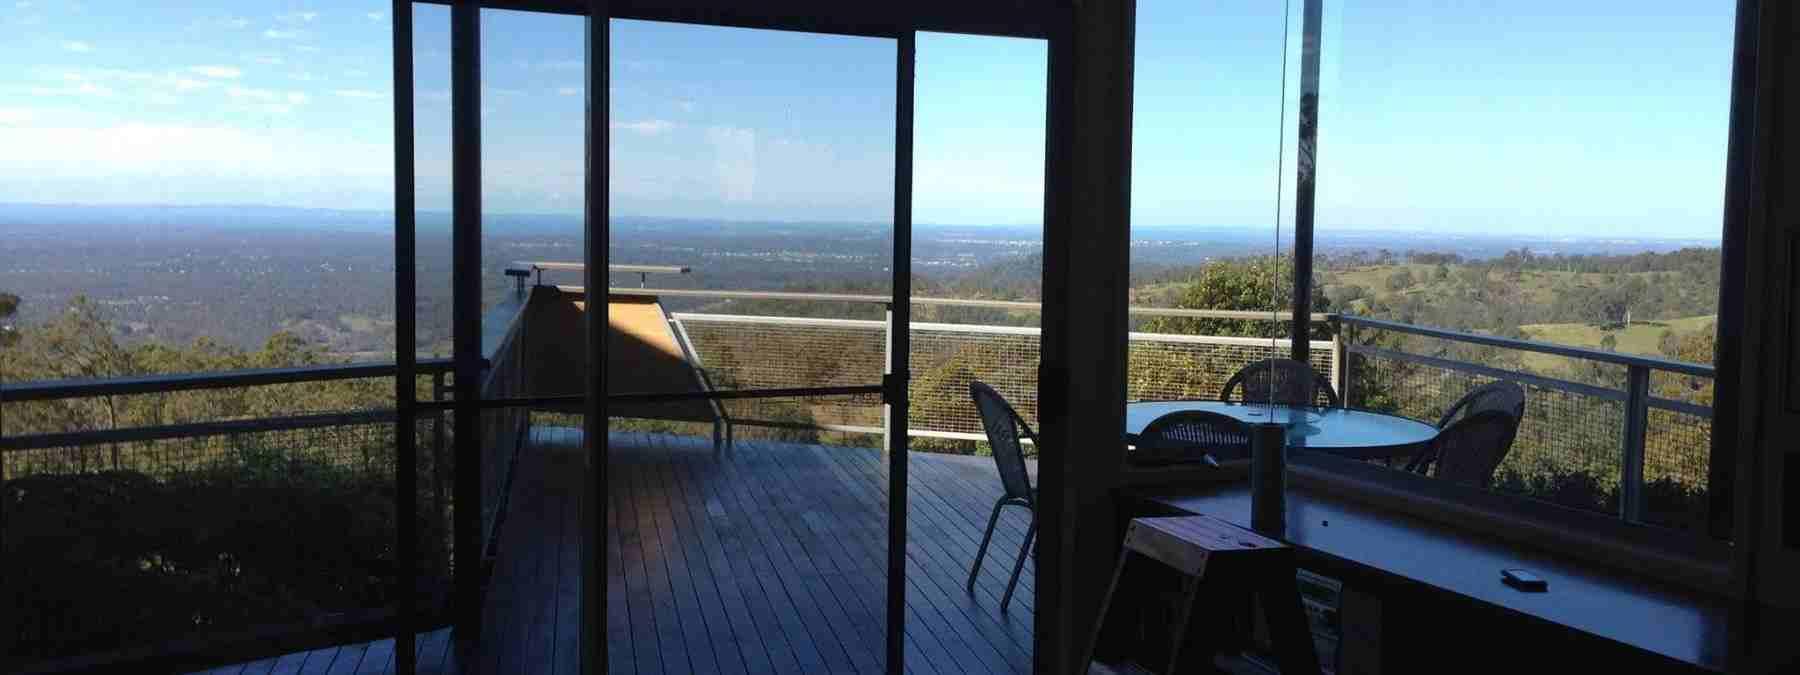 Window tinting overlooking the Gold Coast